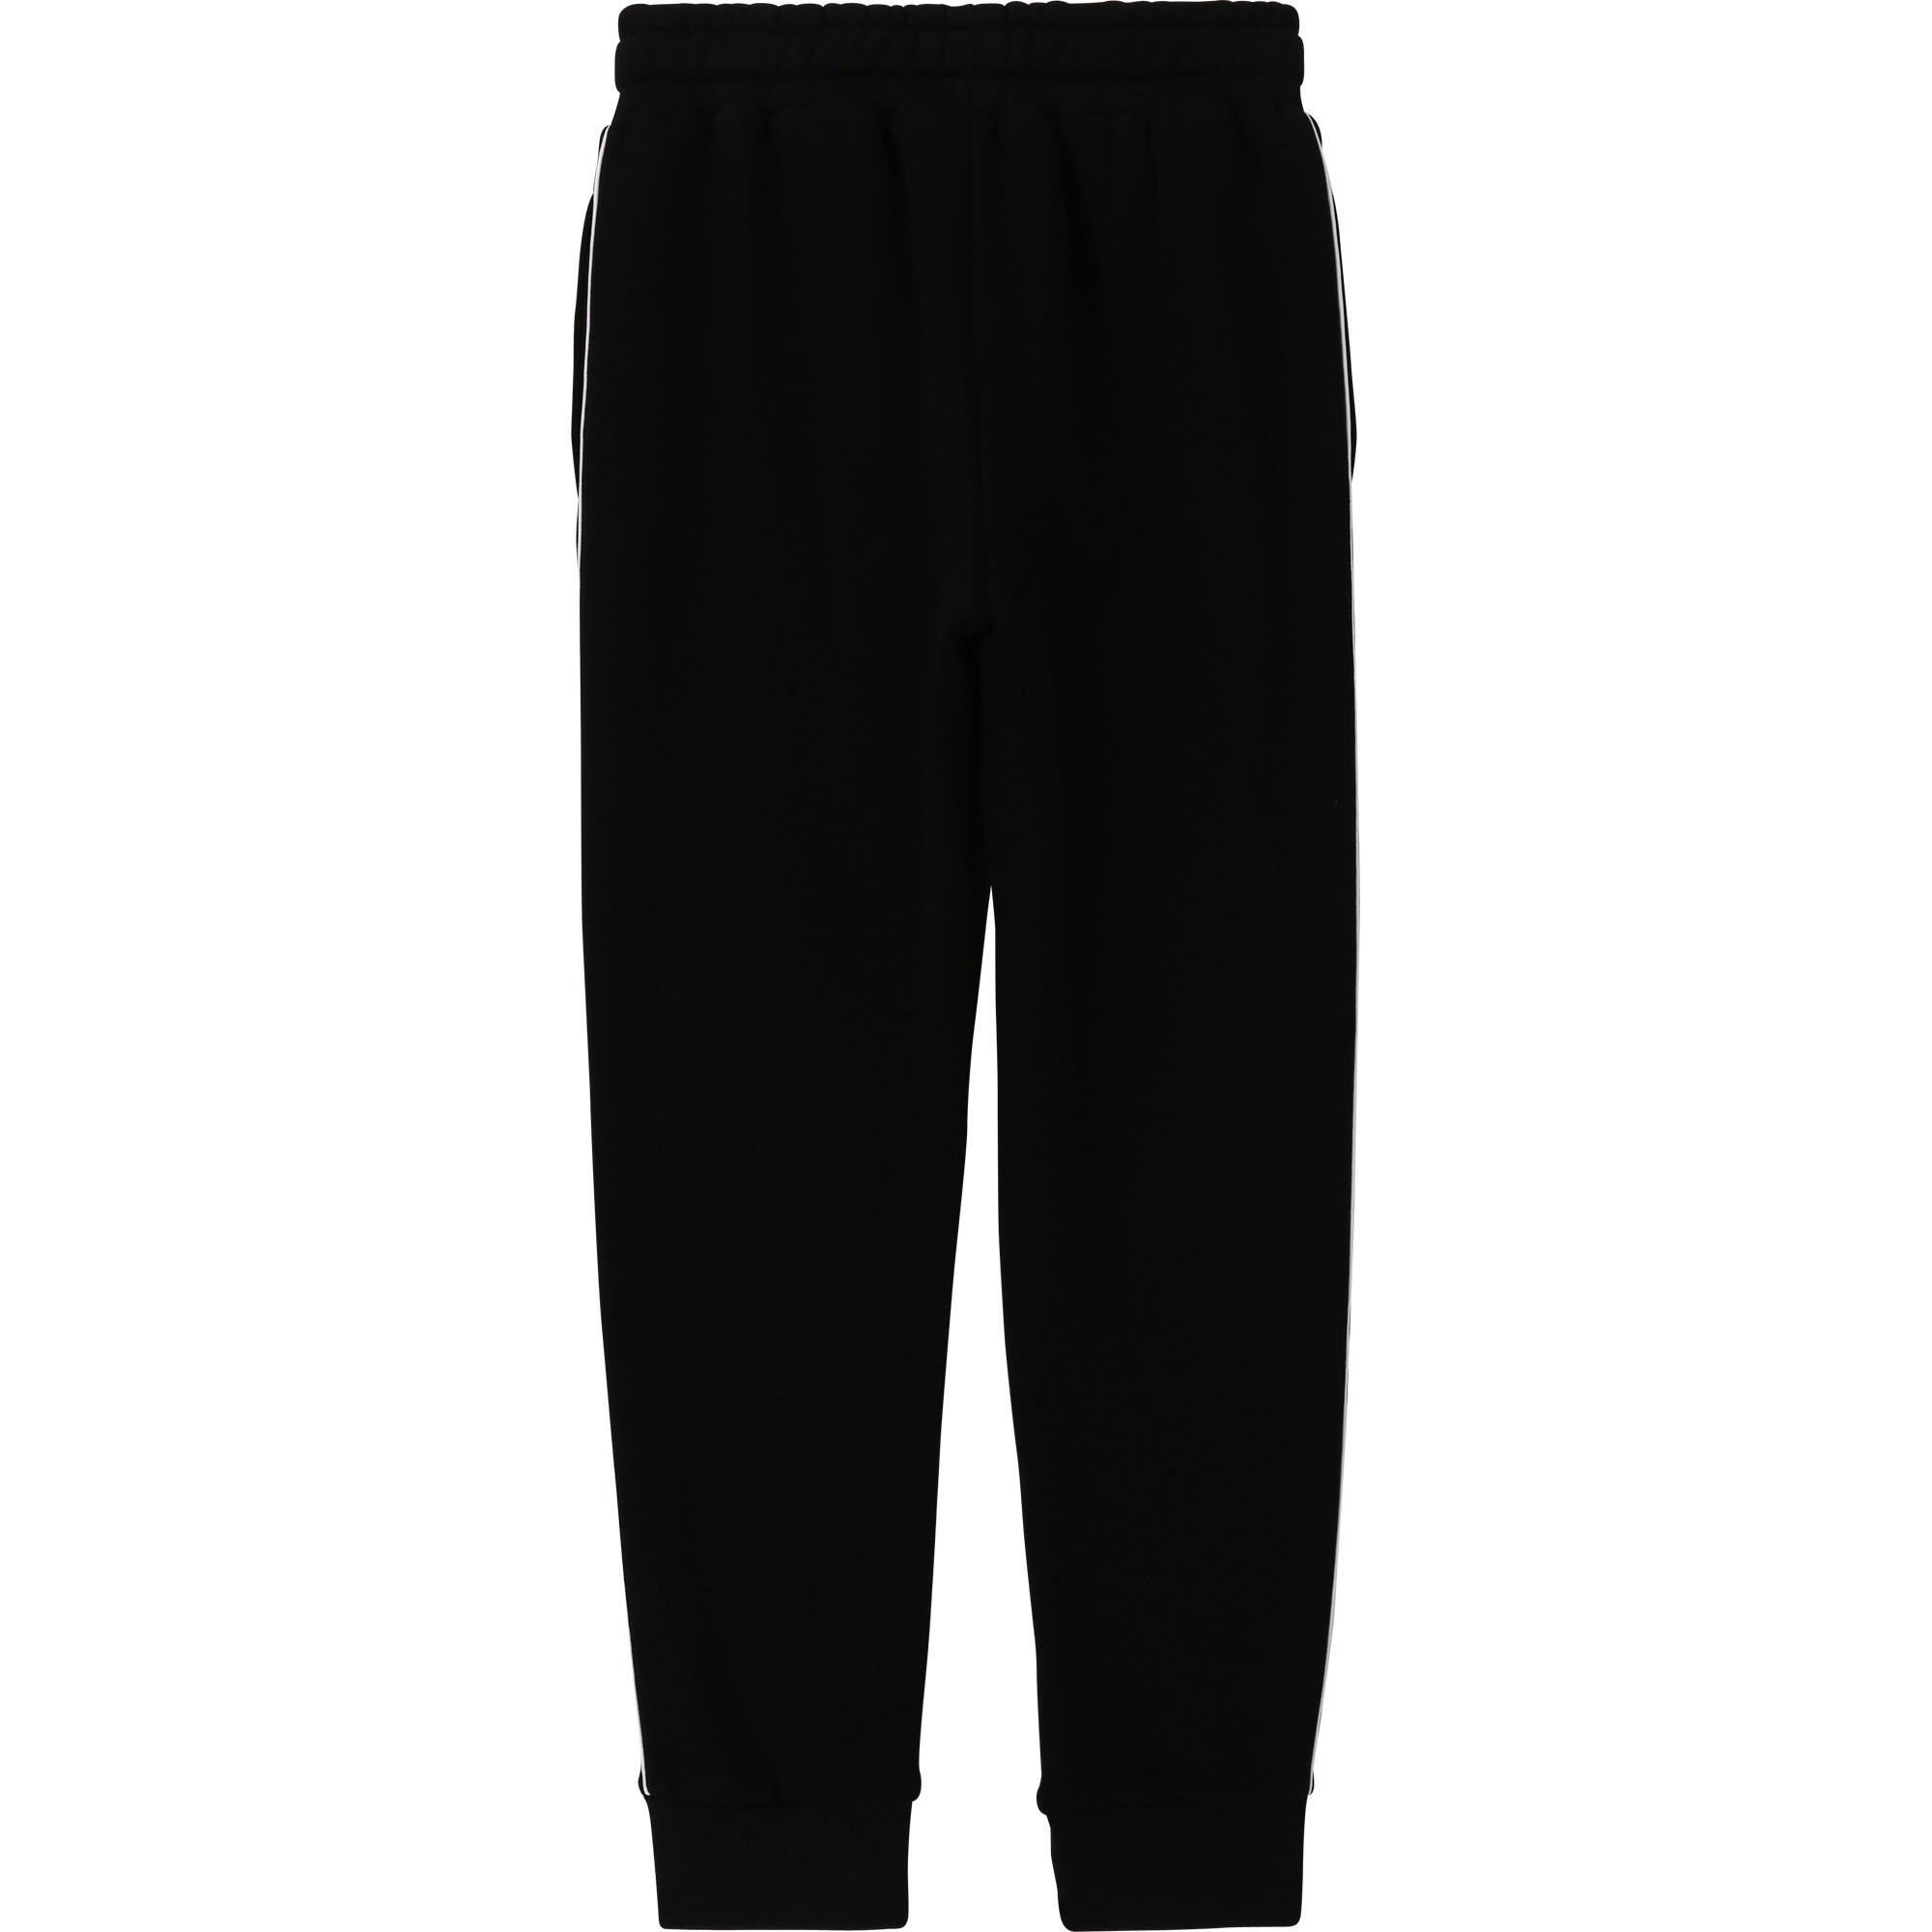 Pantalon de jogging molleton DKNY pour FILLE